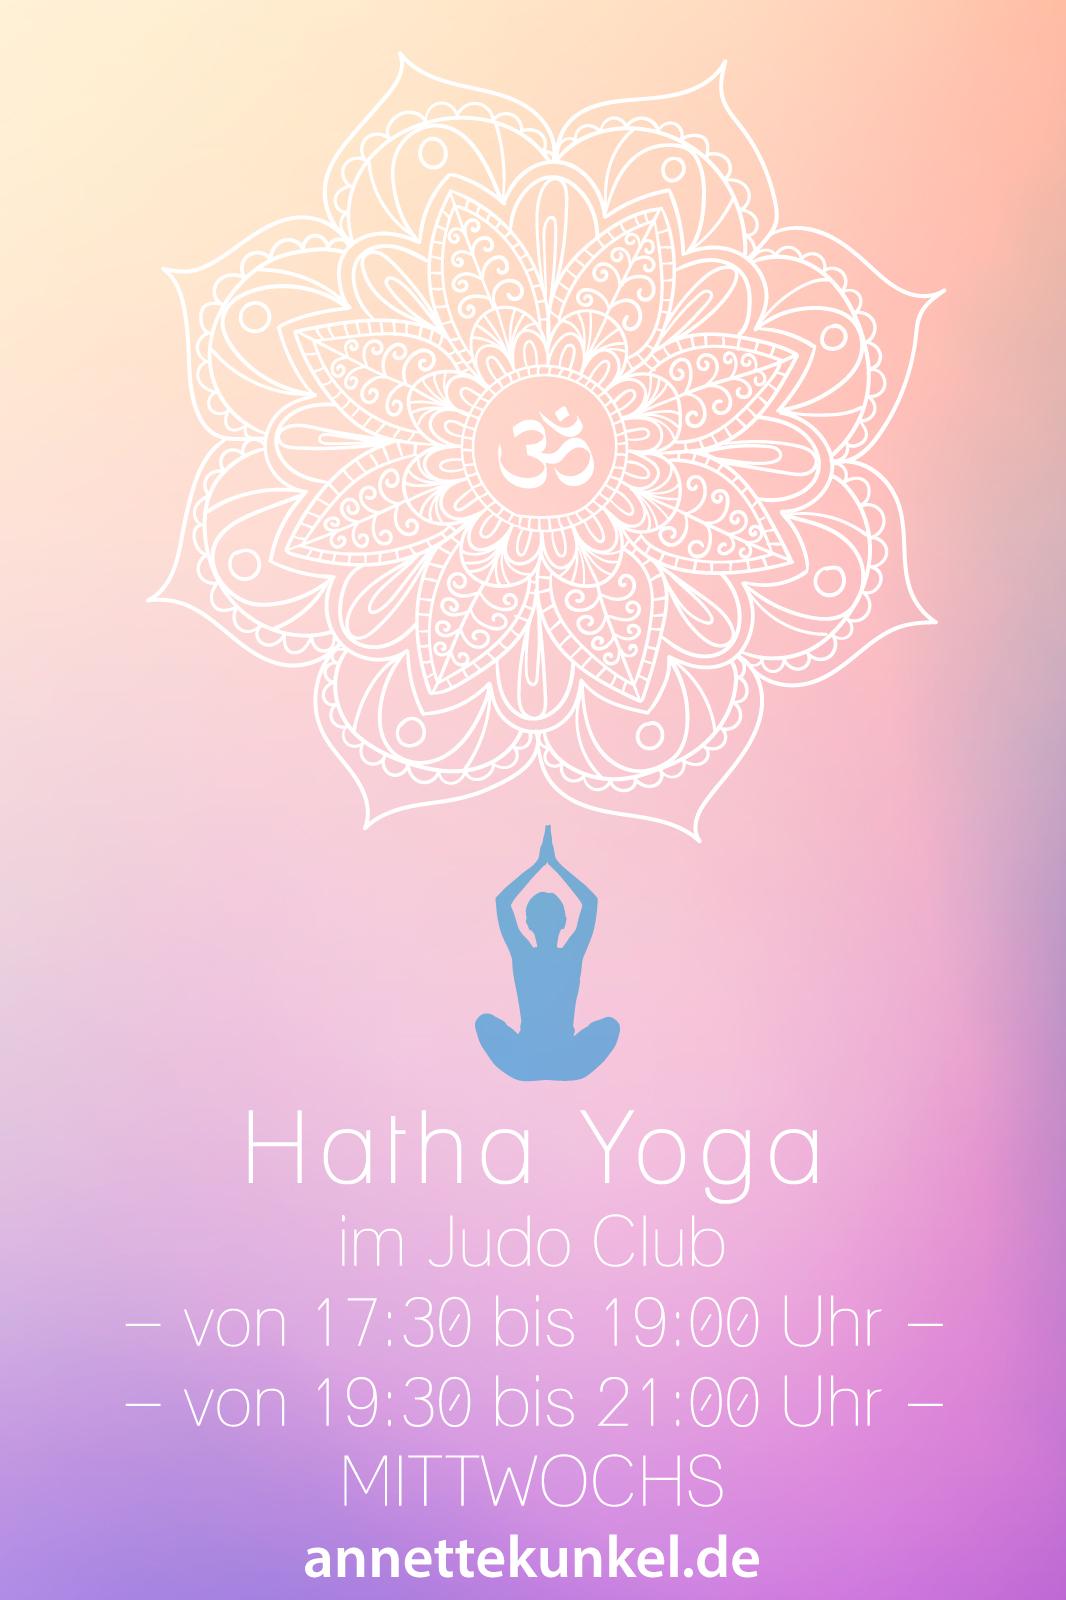 Hatha Yoga in Bad Säckingen ab 10 Euro - direkt am Rhein - geniale Hatha Yoga Stunde.